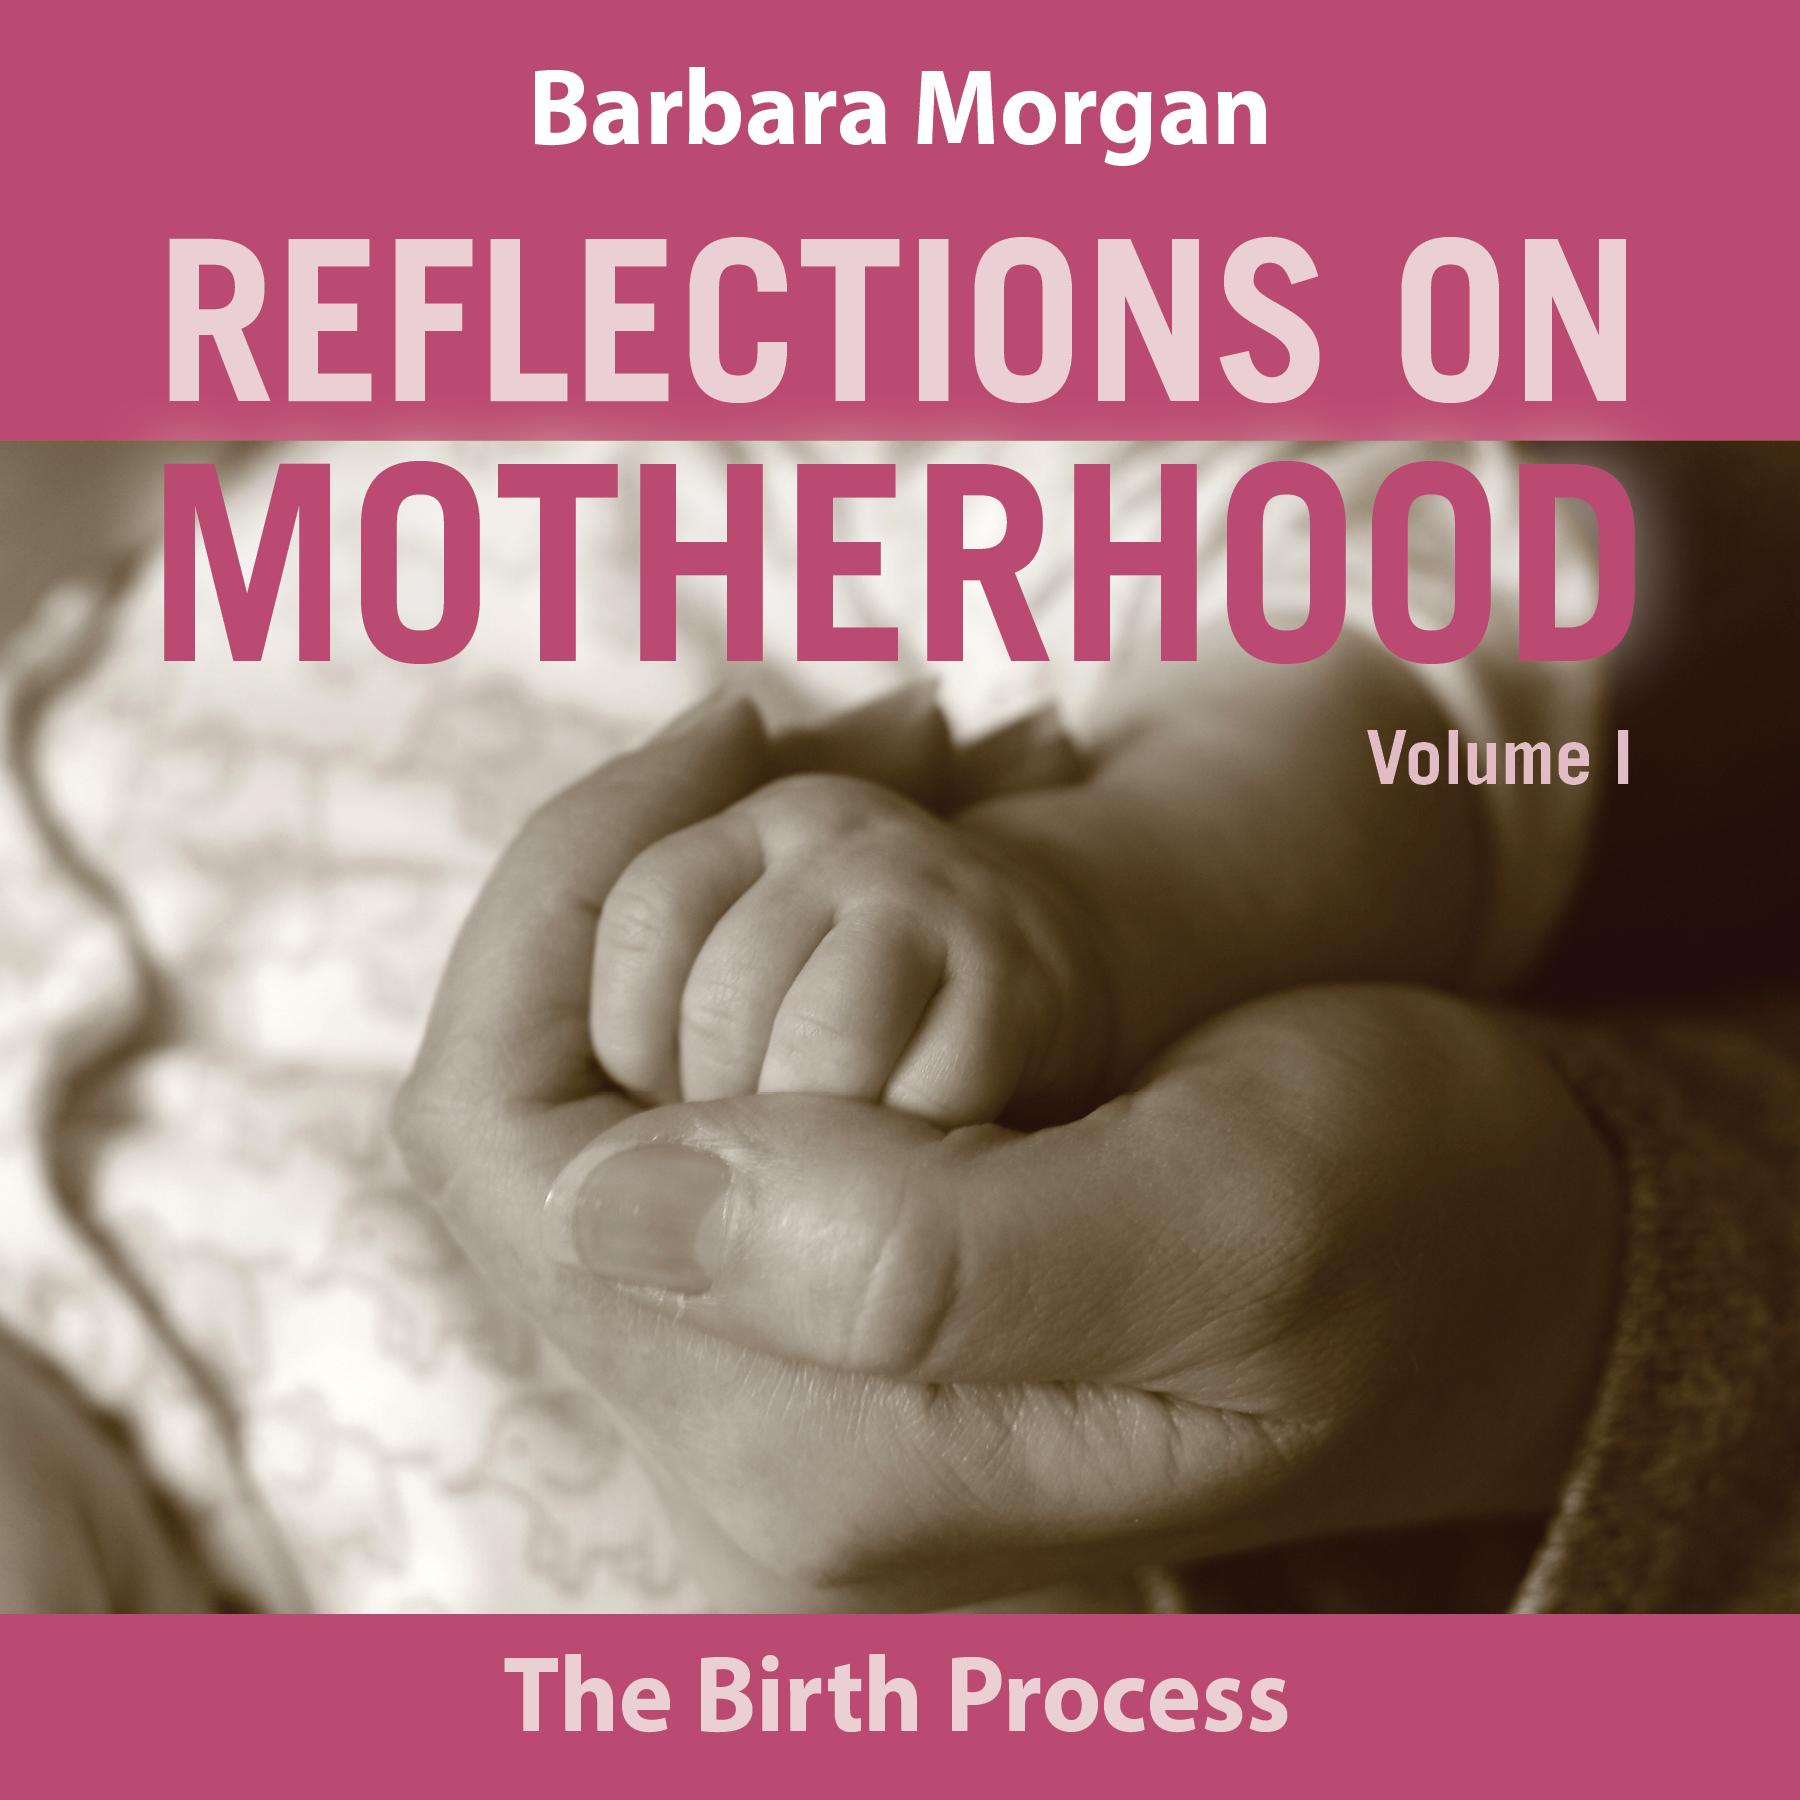 Reflections on Motherhood - Cover FNL.jpg